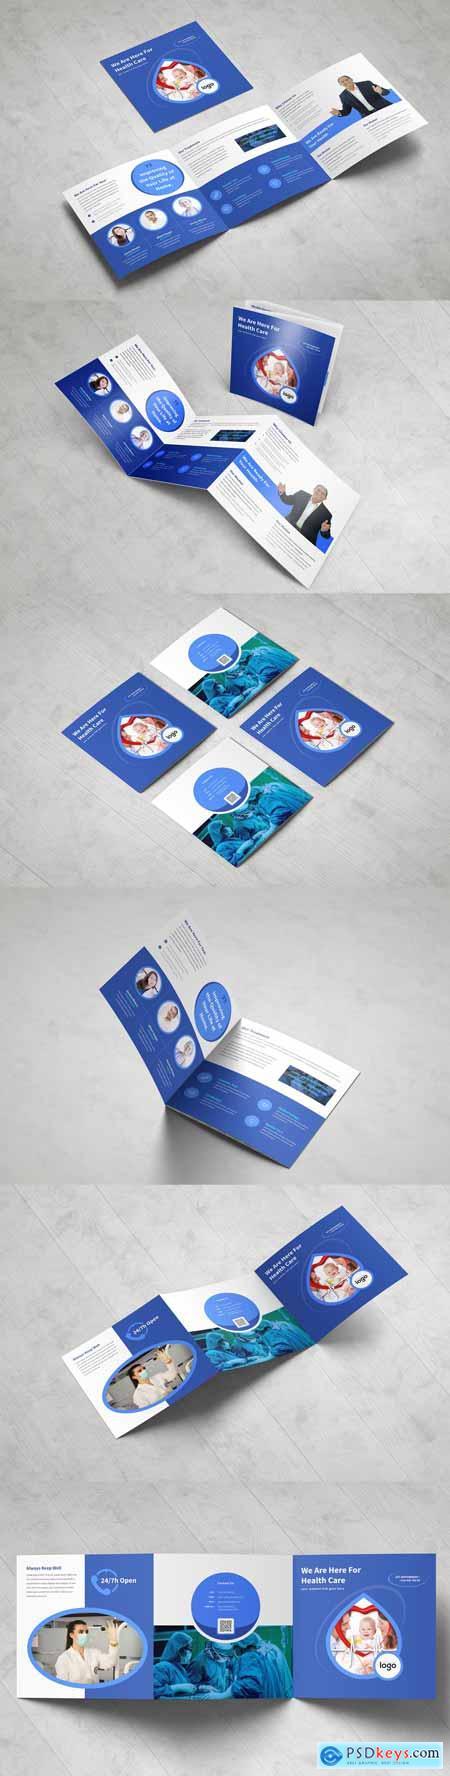 Medical Square Tri fold Brochure 3378797